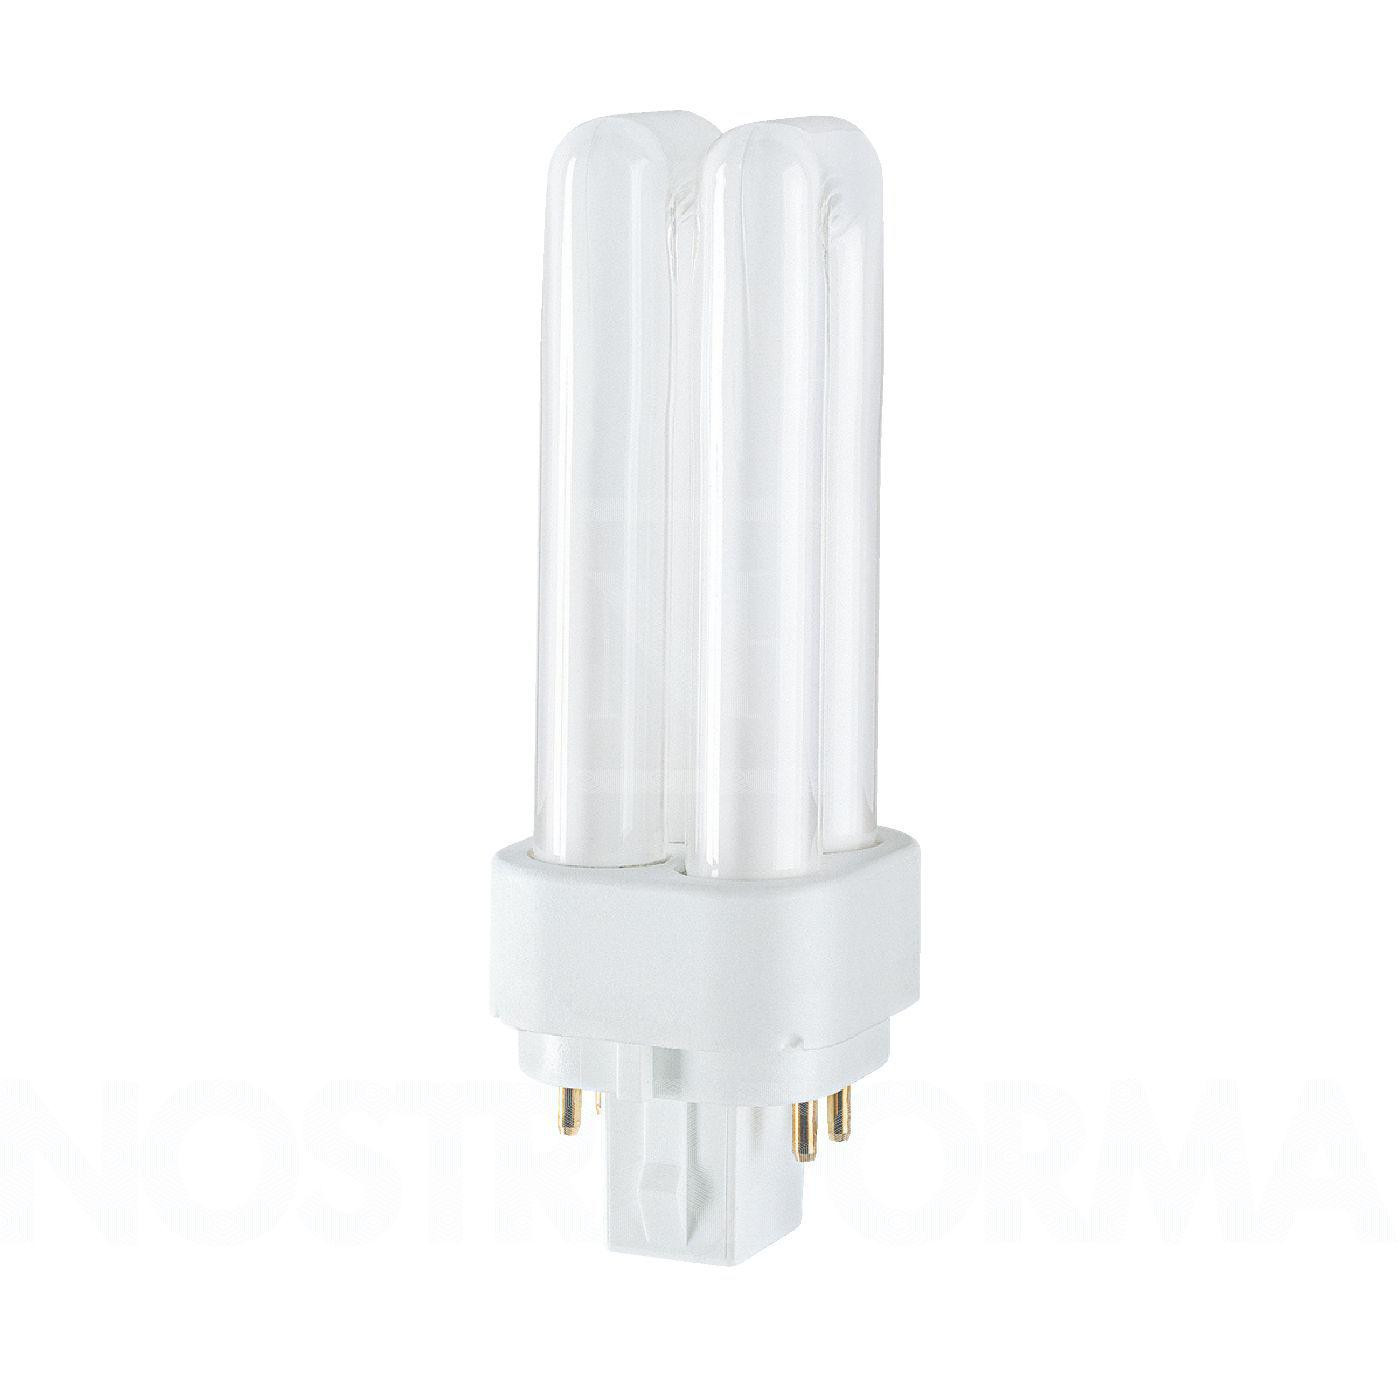 Osram Kompaktleuchtstofflampe Zweifach-Doppelrohr TC-DEL 10W/827 G24q-1 warmweiß extra